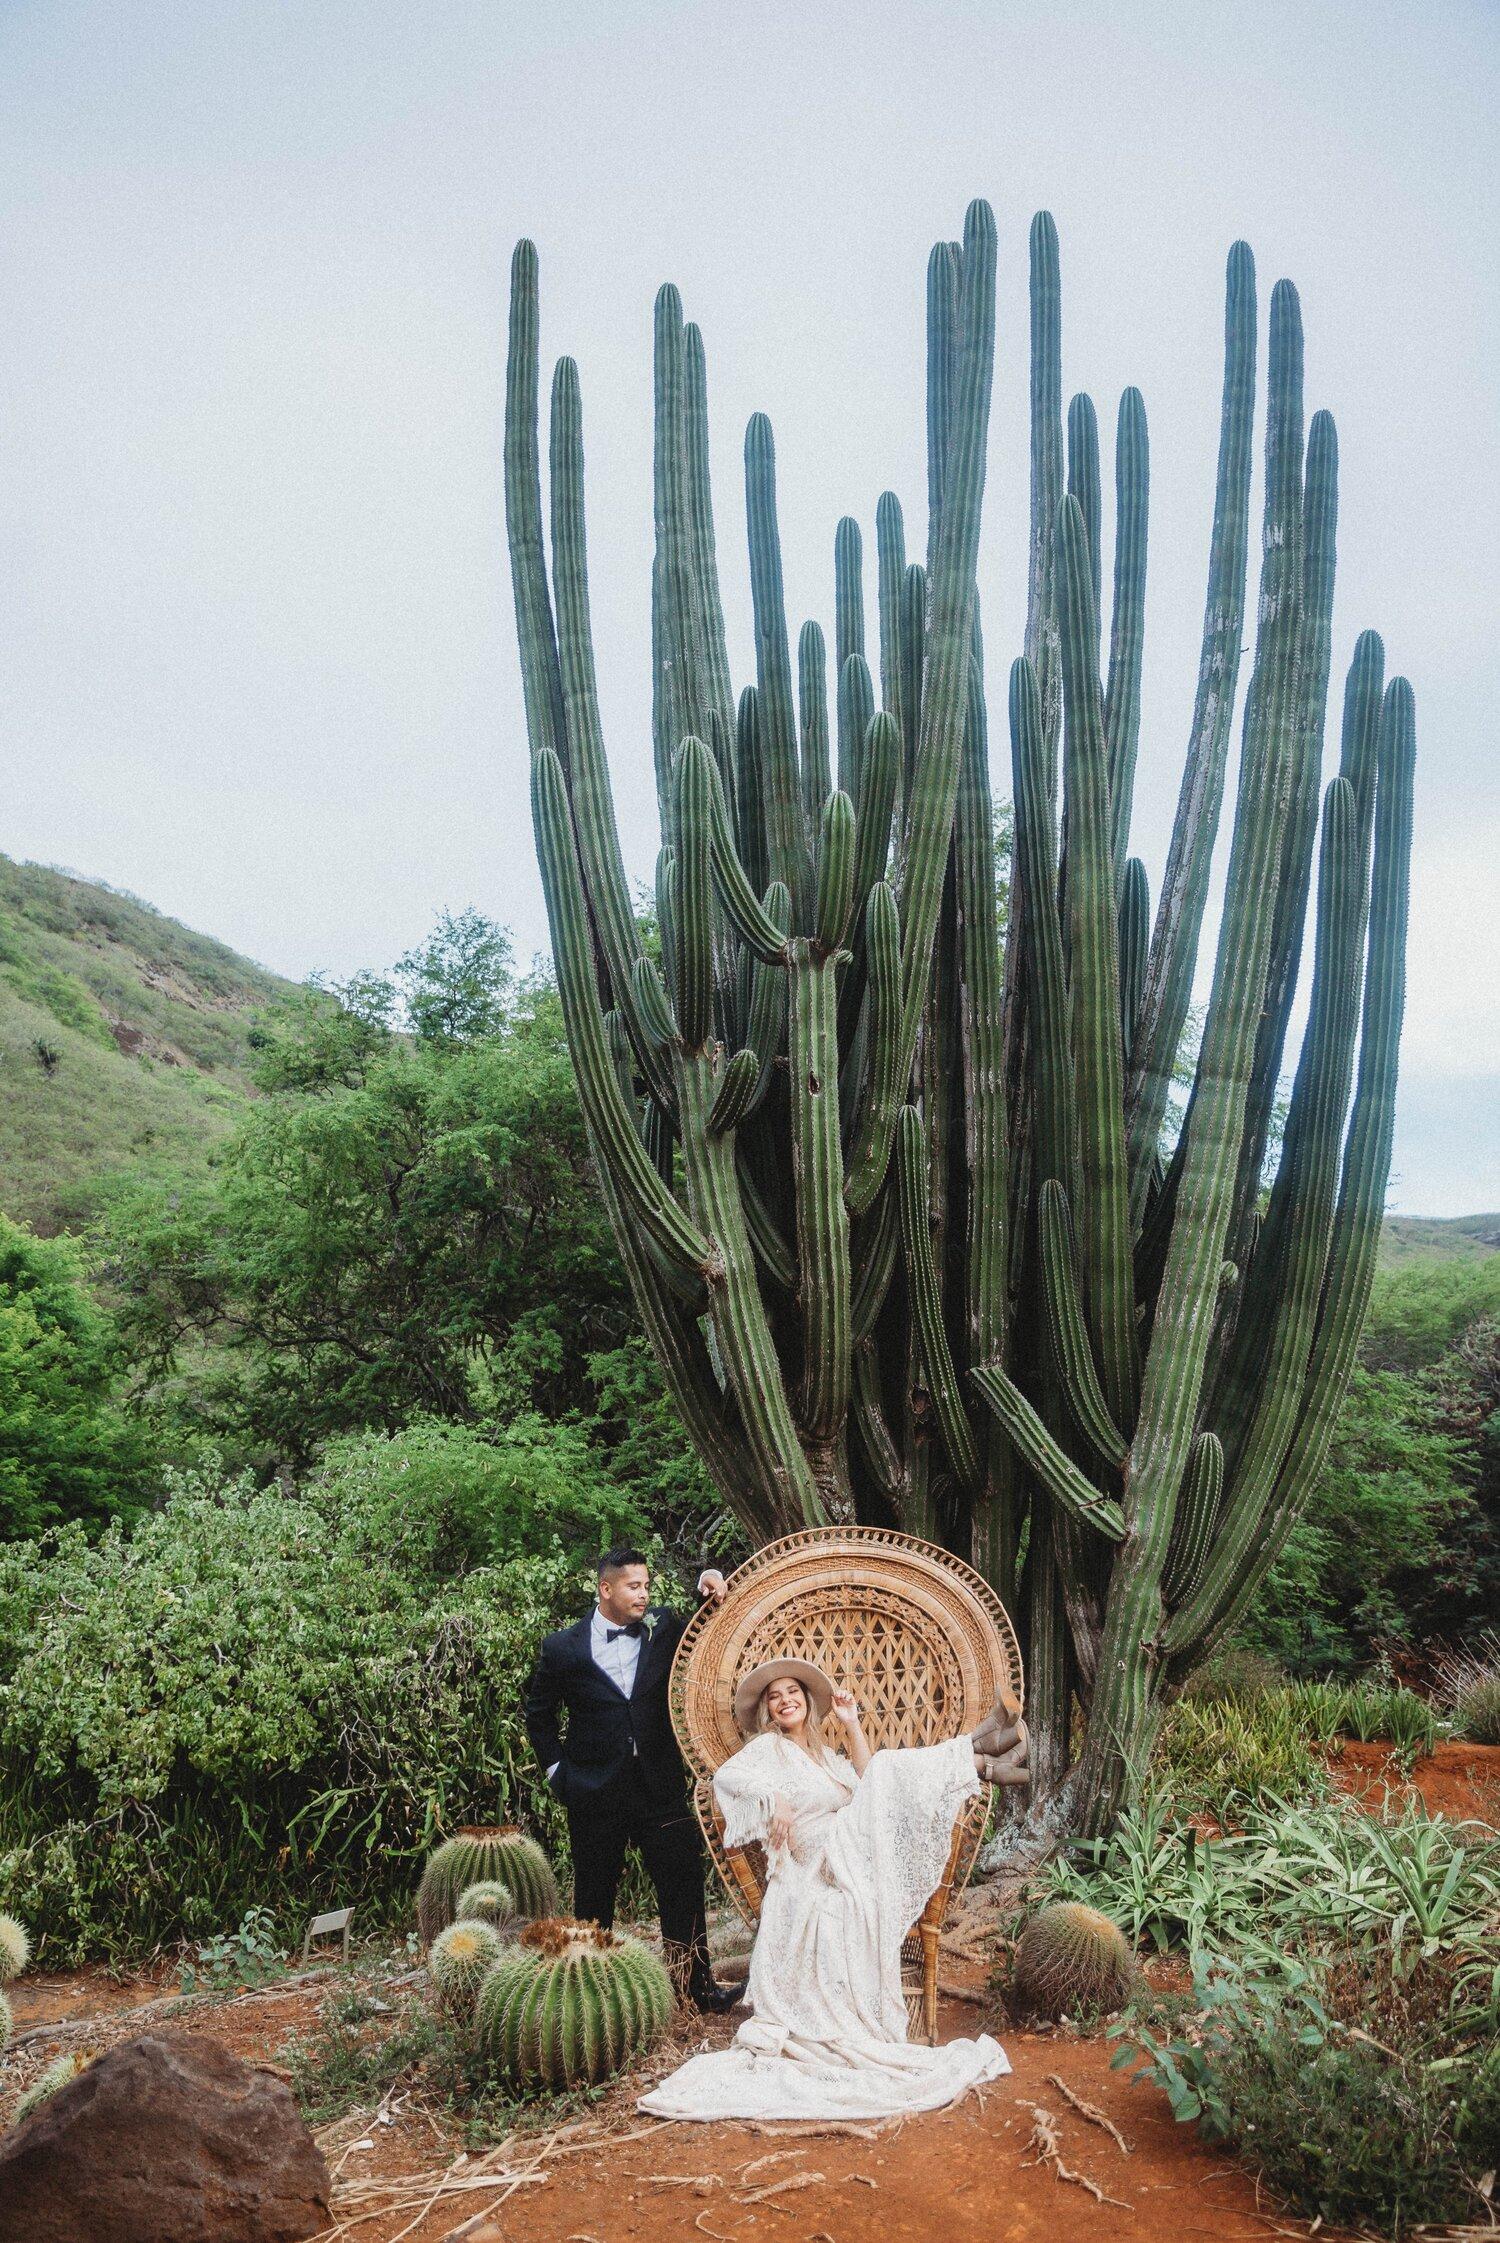 Boho Cactus Elopement - Honolulu, Koko Crater Botanical Garden - Oahu Hawaii Wedding Photographer 12.jpg